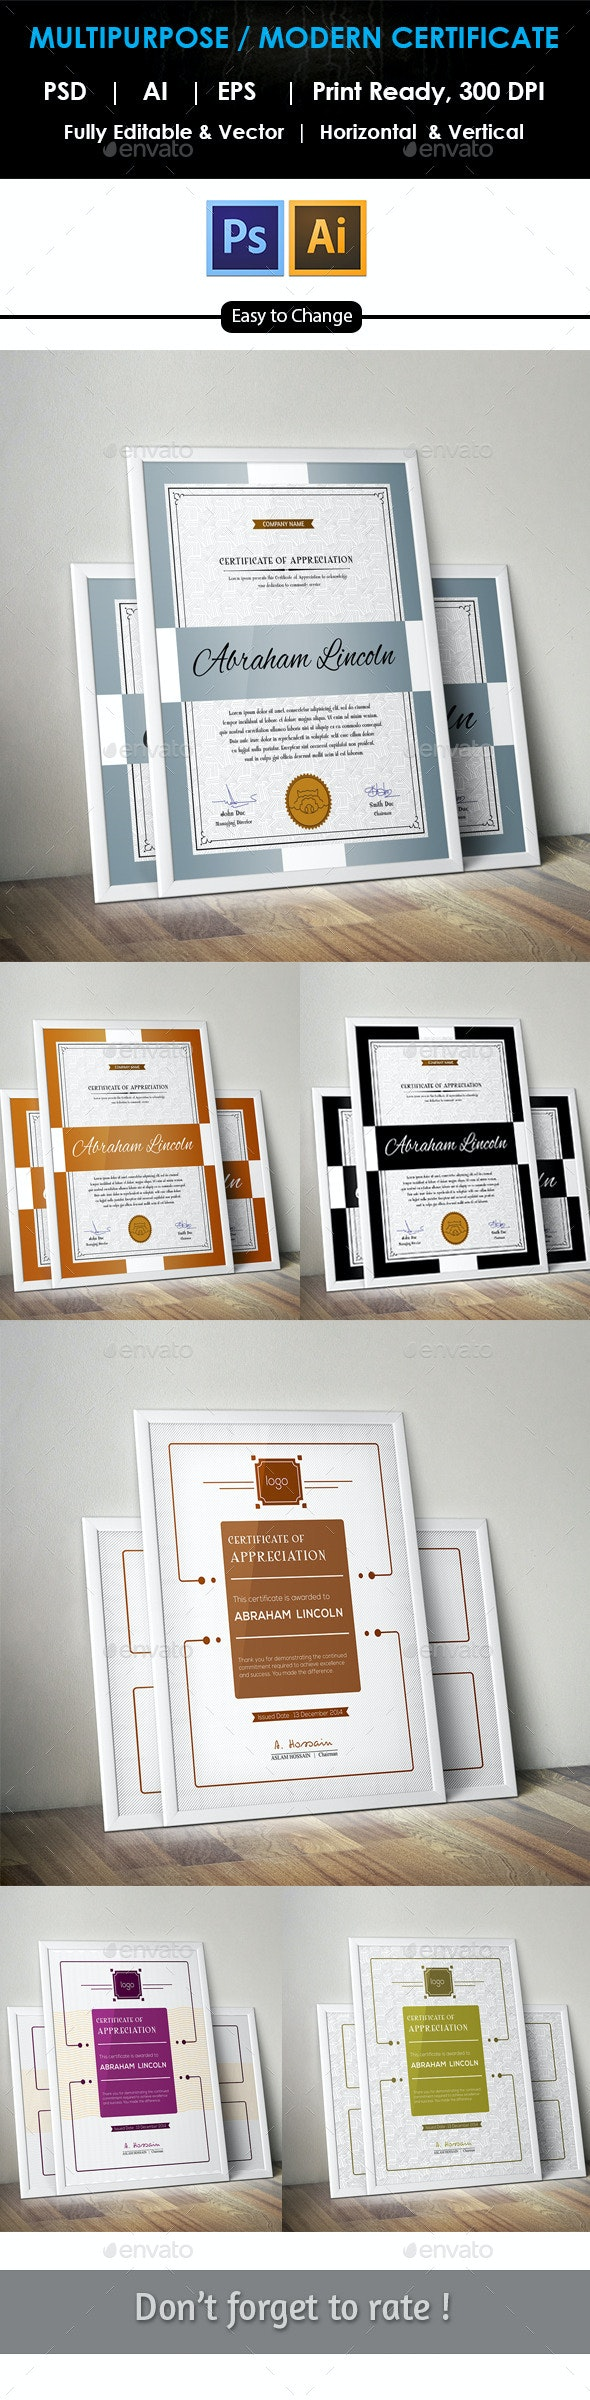 Multipurpose Certificates Bundle GD02 - Certificates Stationery